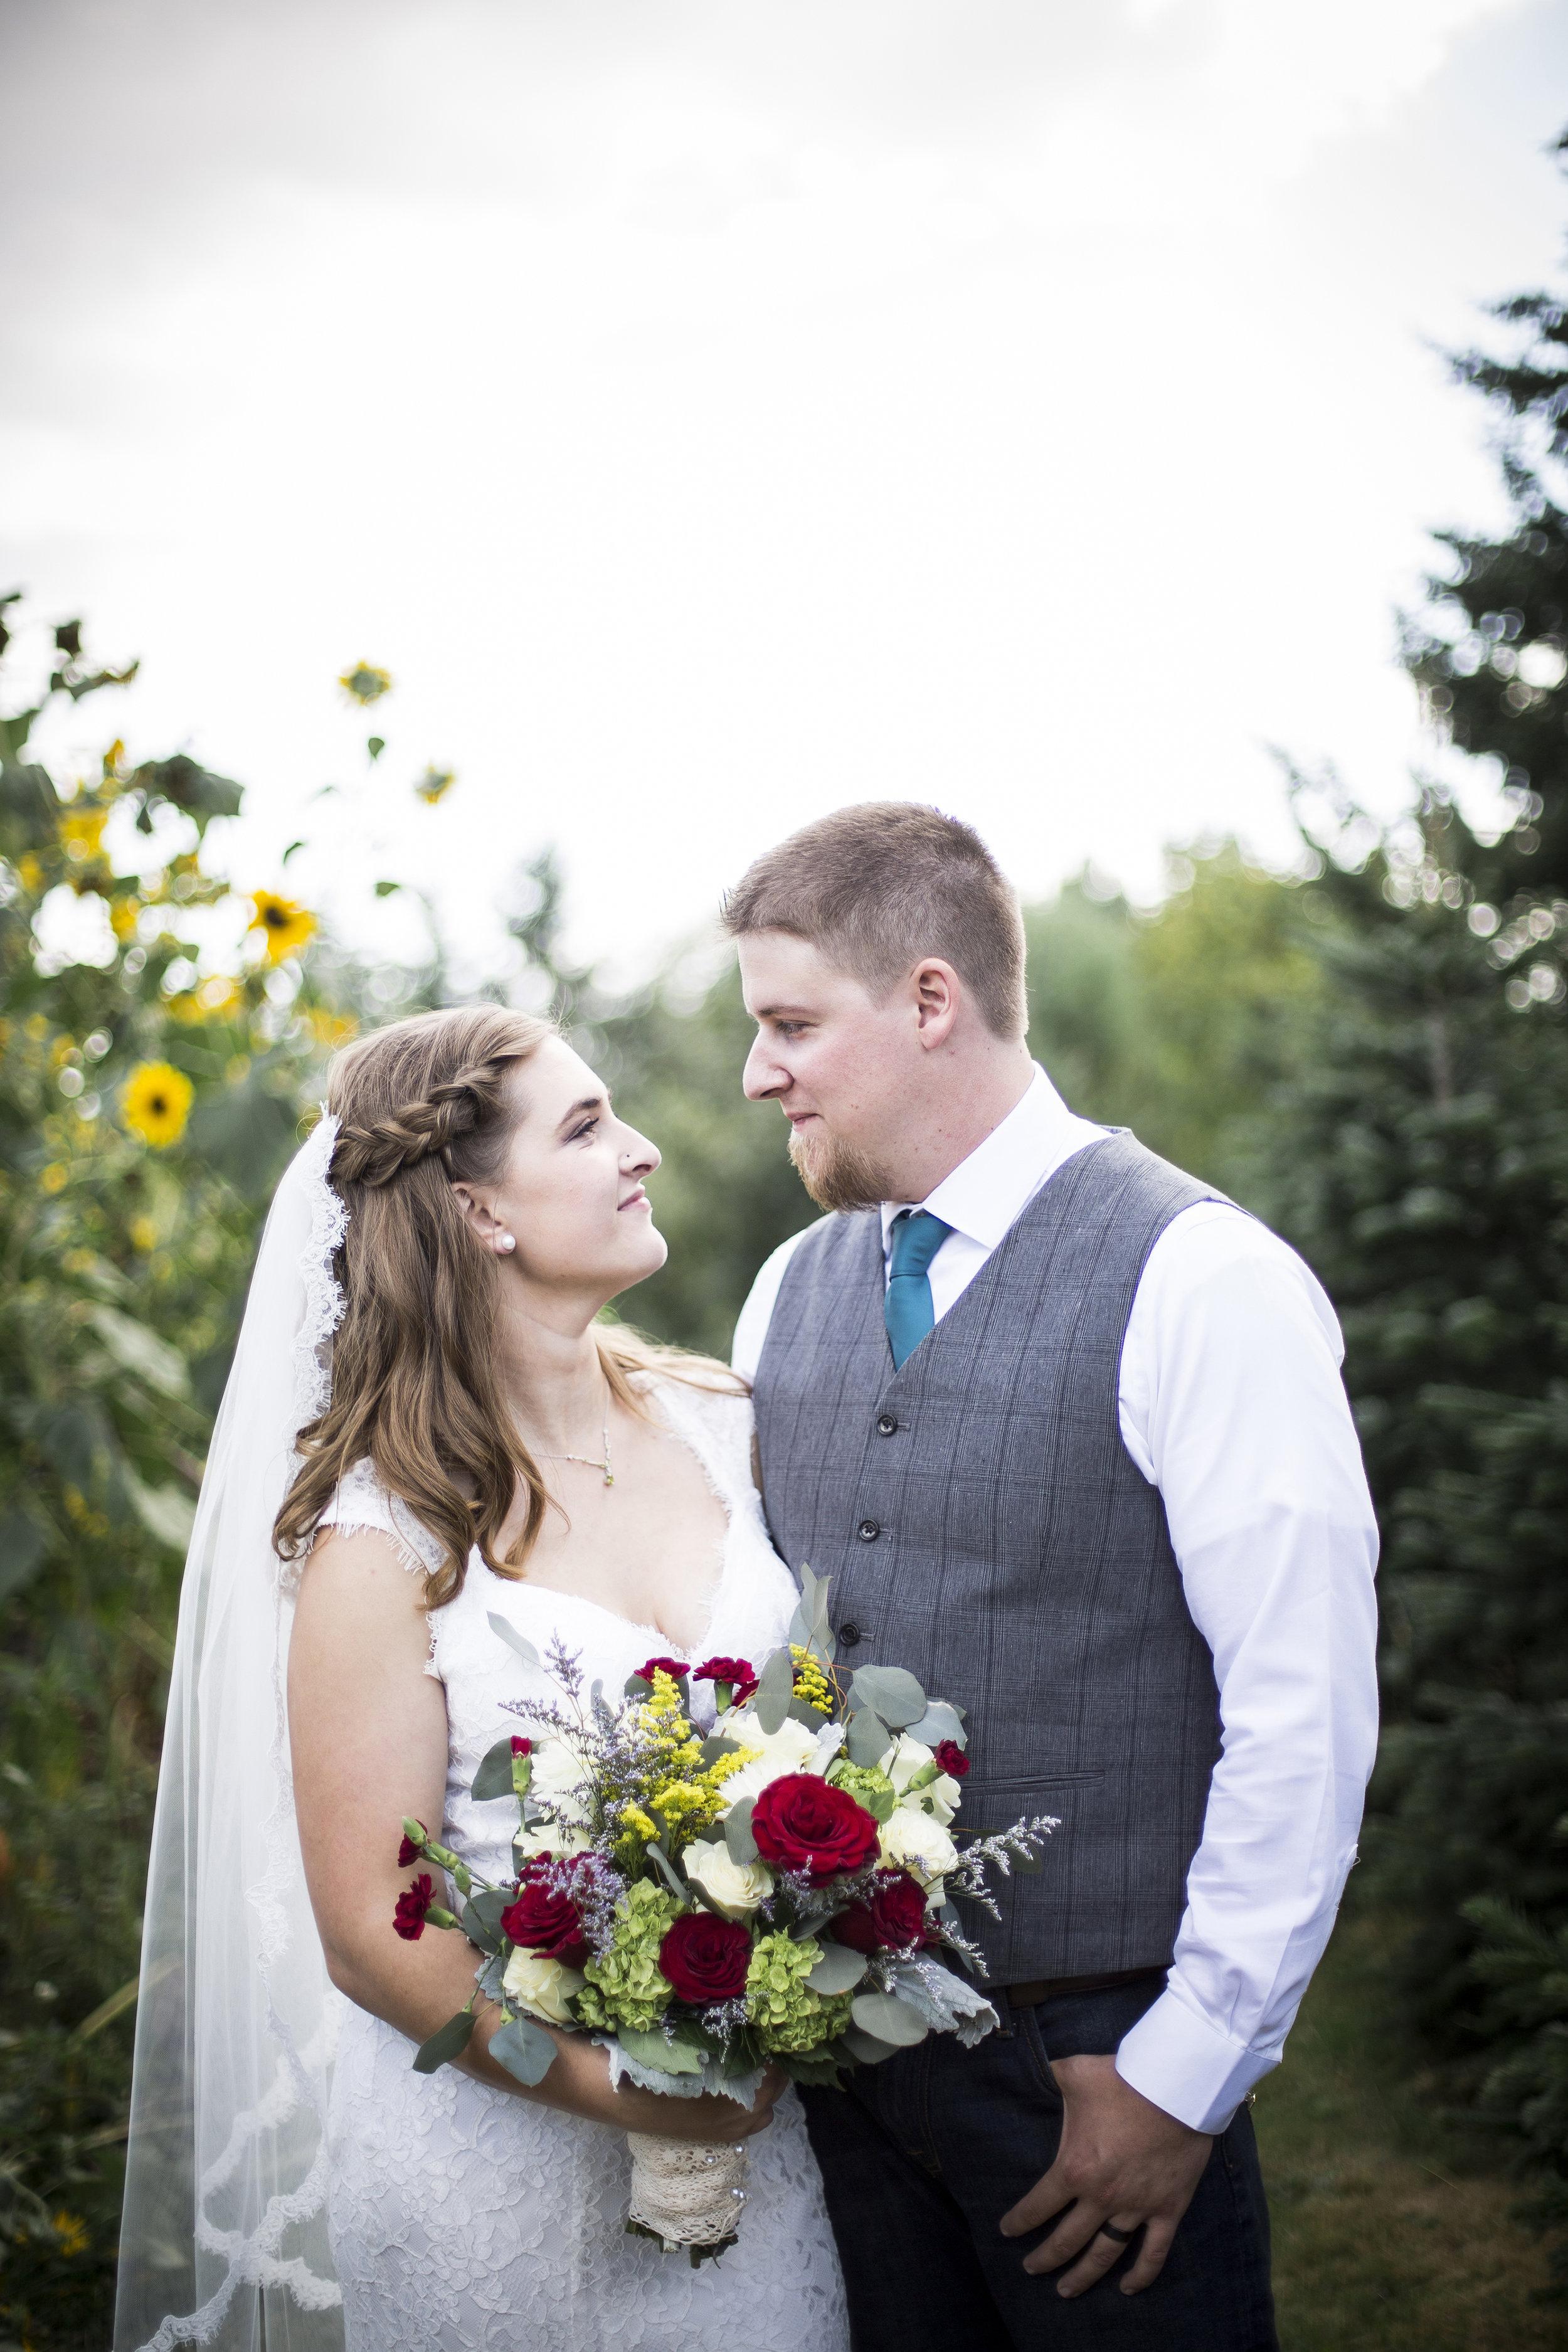 Seattle-Tacoma-Wedding-Photographer-Jaeda-Reed-Fall-Glenwood-Tree-Farm-11.jpg